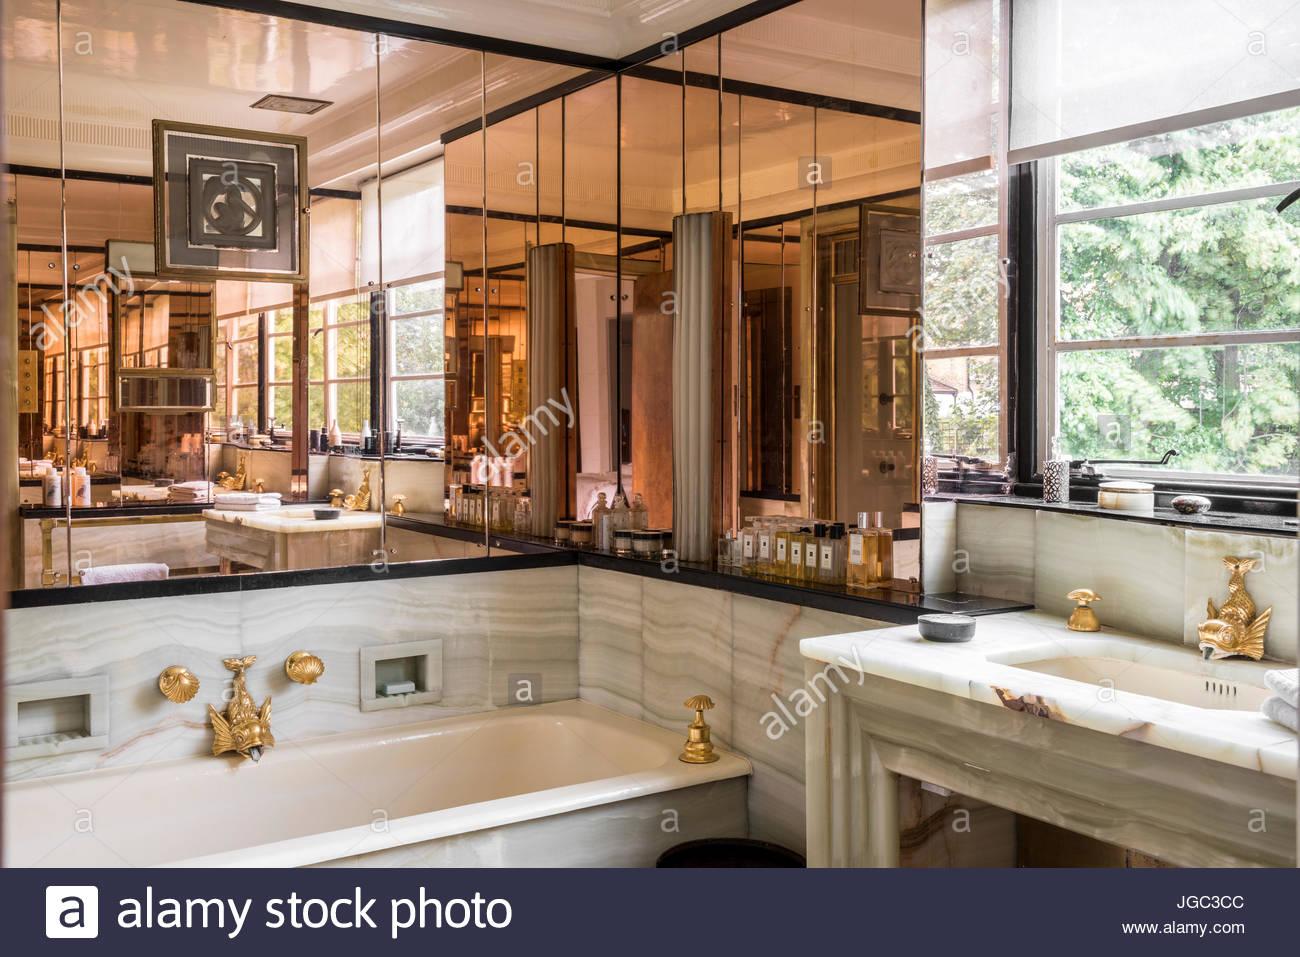 Art Deco Bathroom Stockfotos & Art Deco Bathroom Bilder - Alamy